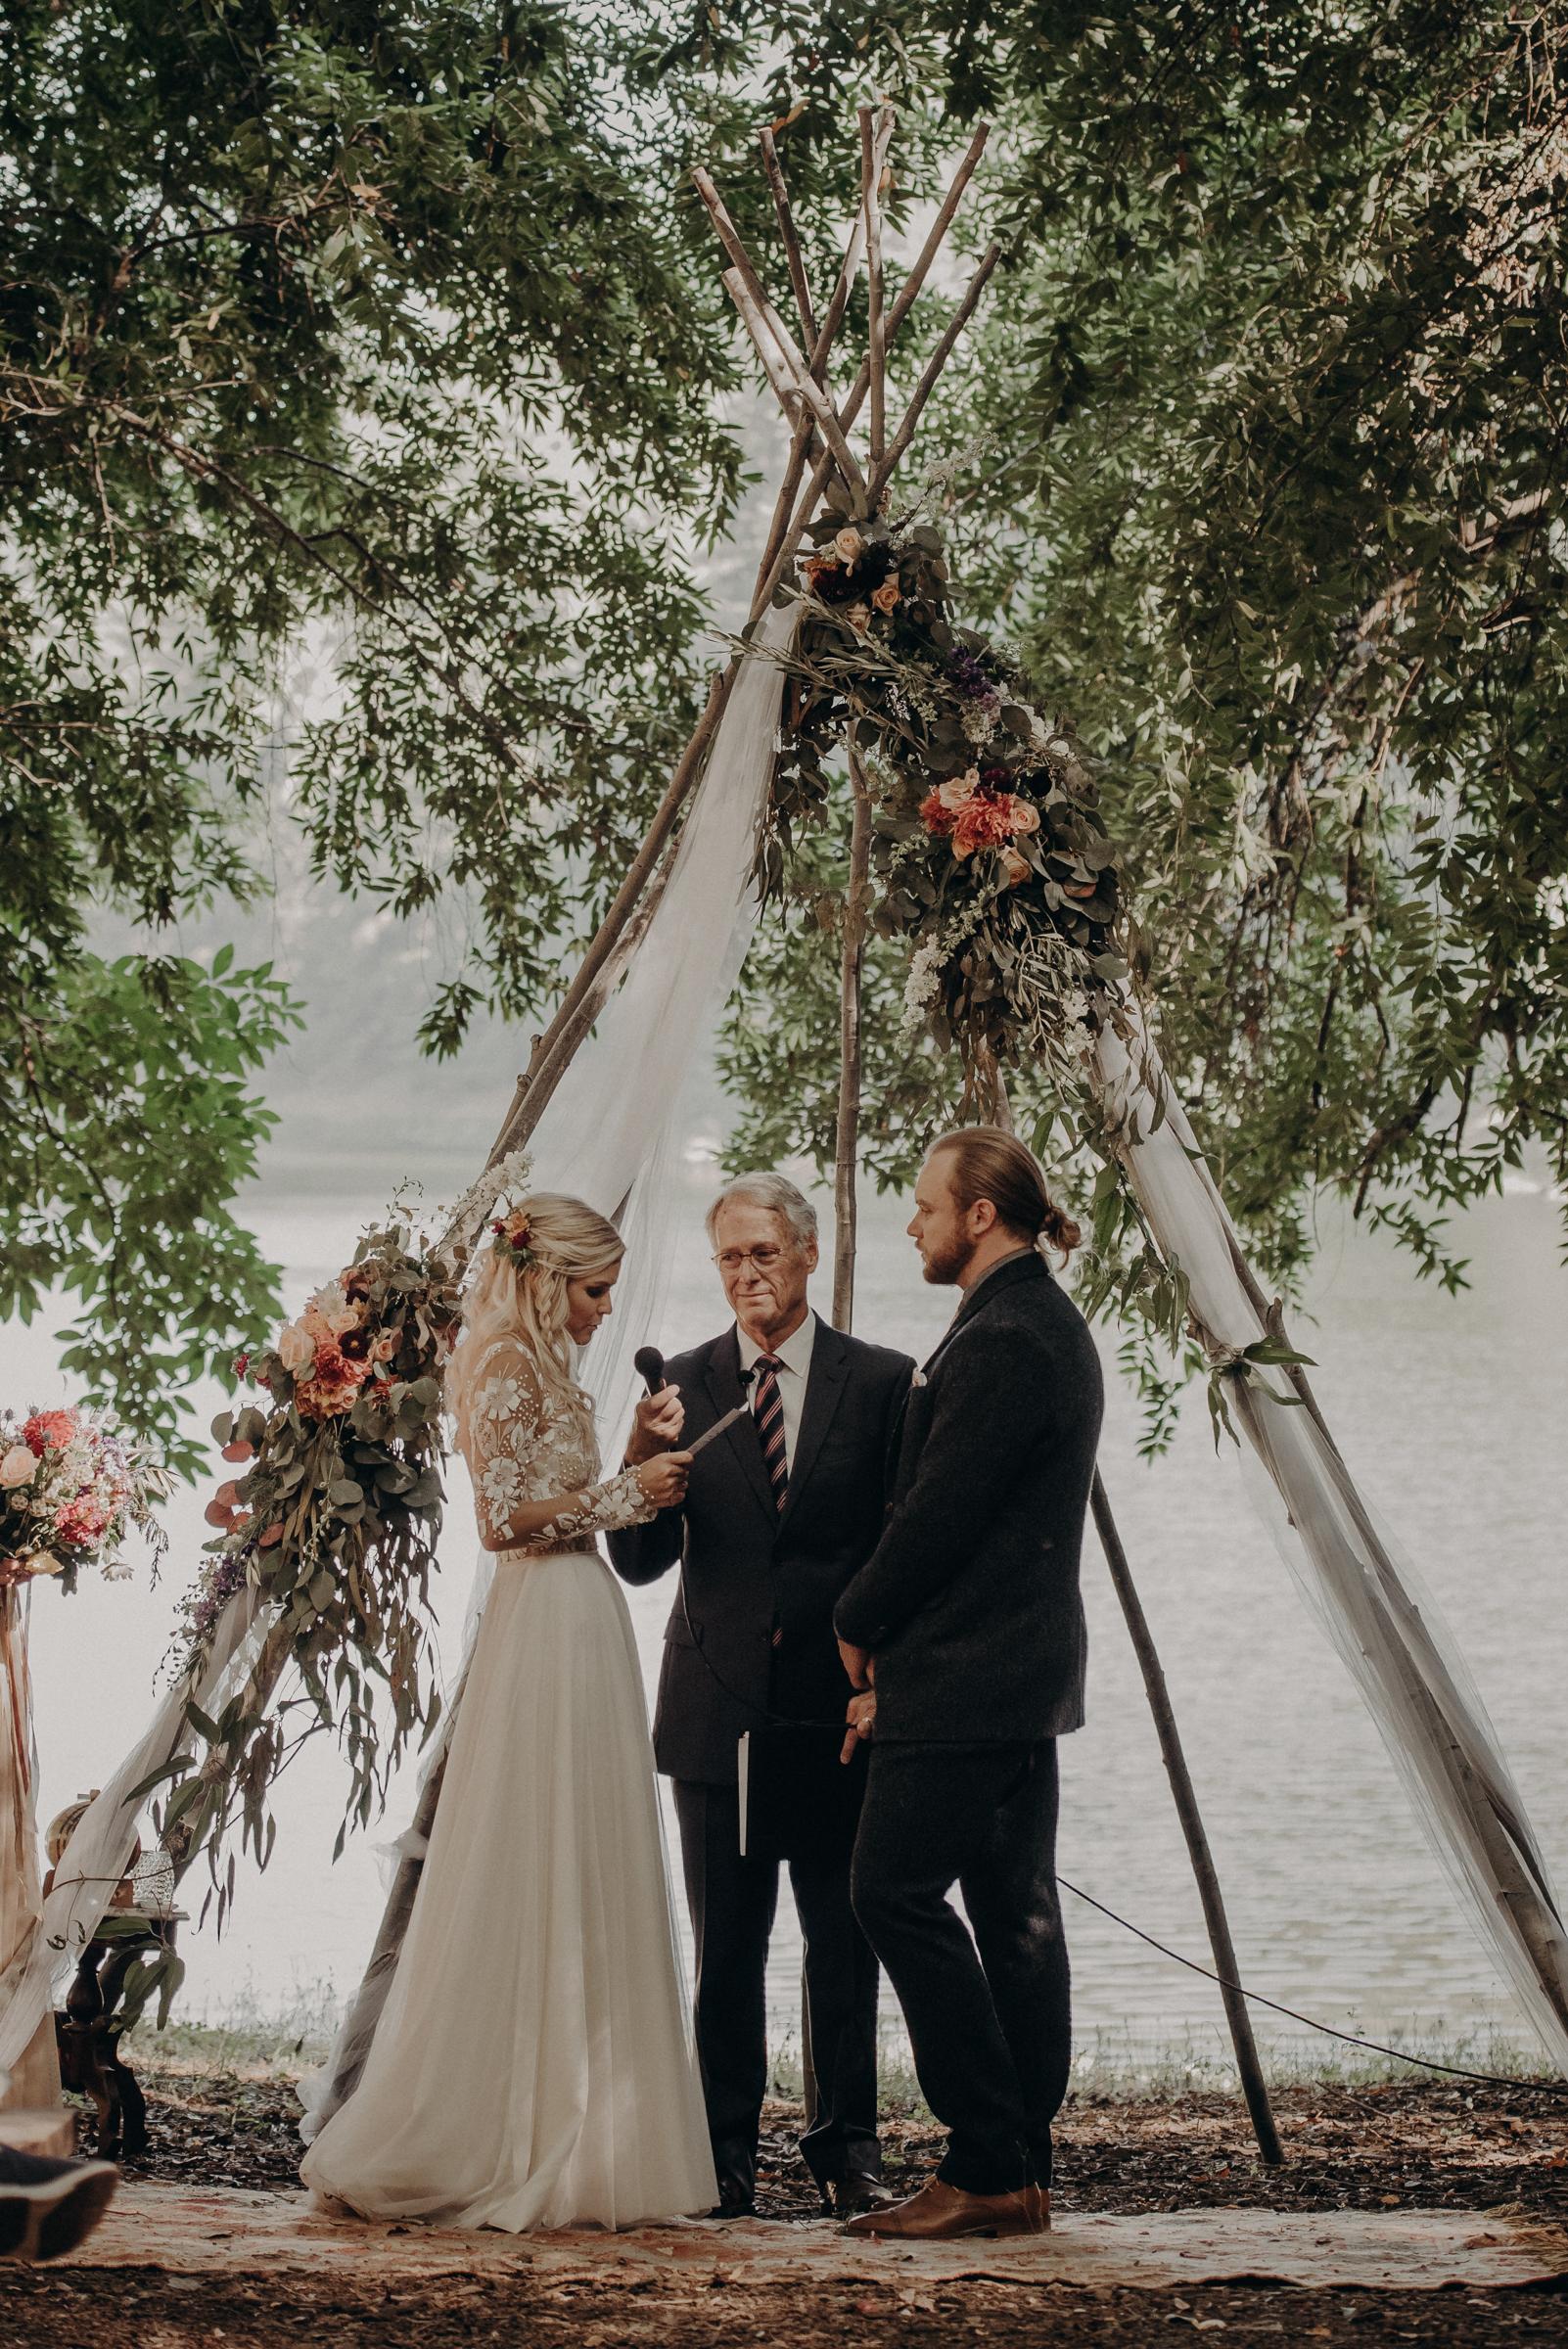 IsaiahAndTaylor.com - California Destination Elopement, Lake Leonard Reserve Wedding, Ukiah-106.jpg